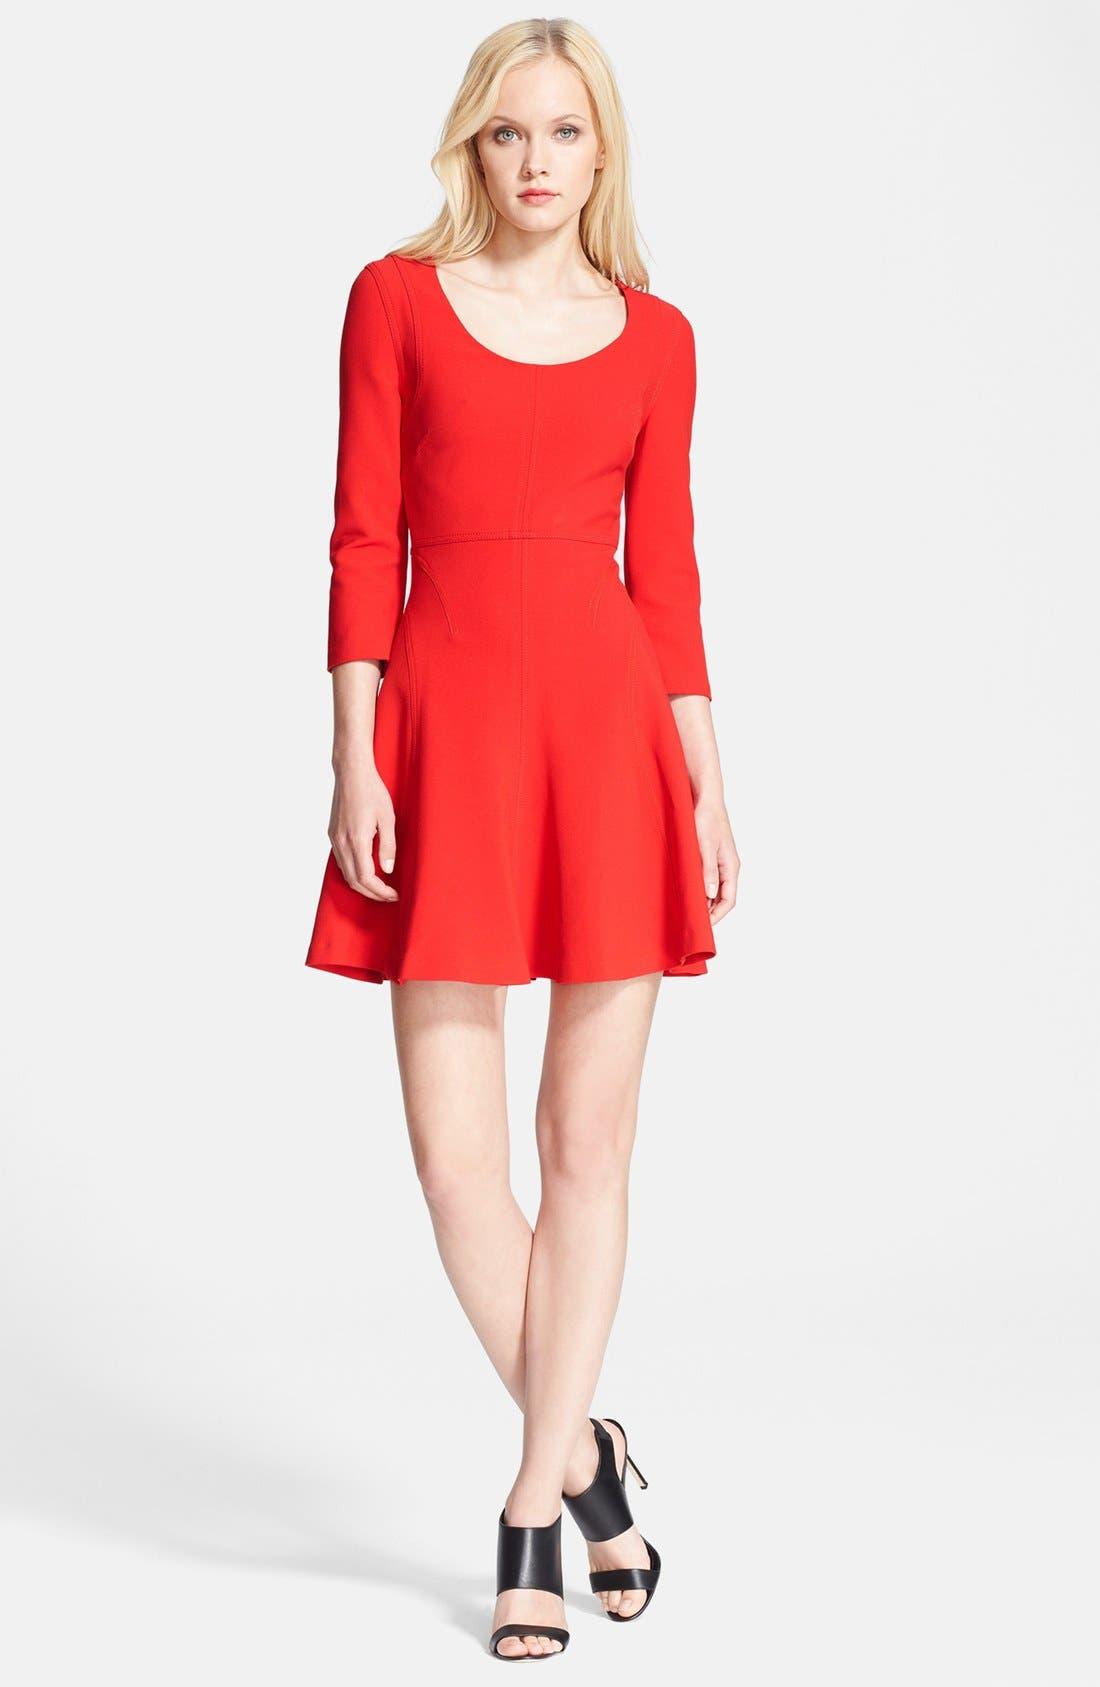 Main Image - Diane von Furstenberg 'Paloma' Woven Fit & Flare Dress